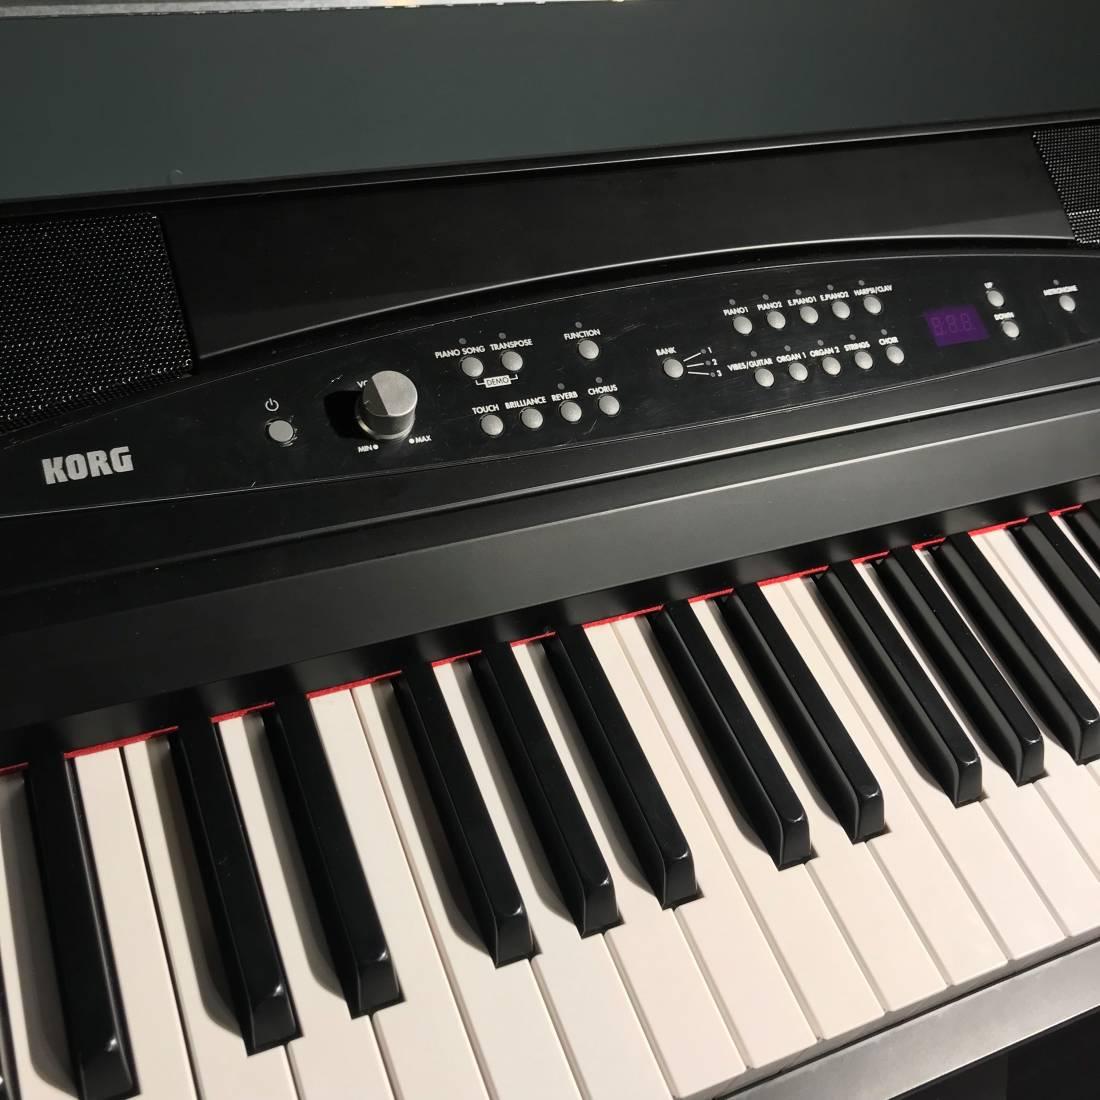 Digital Piano Transpose Feature - Digital Photos and Descriptions